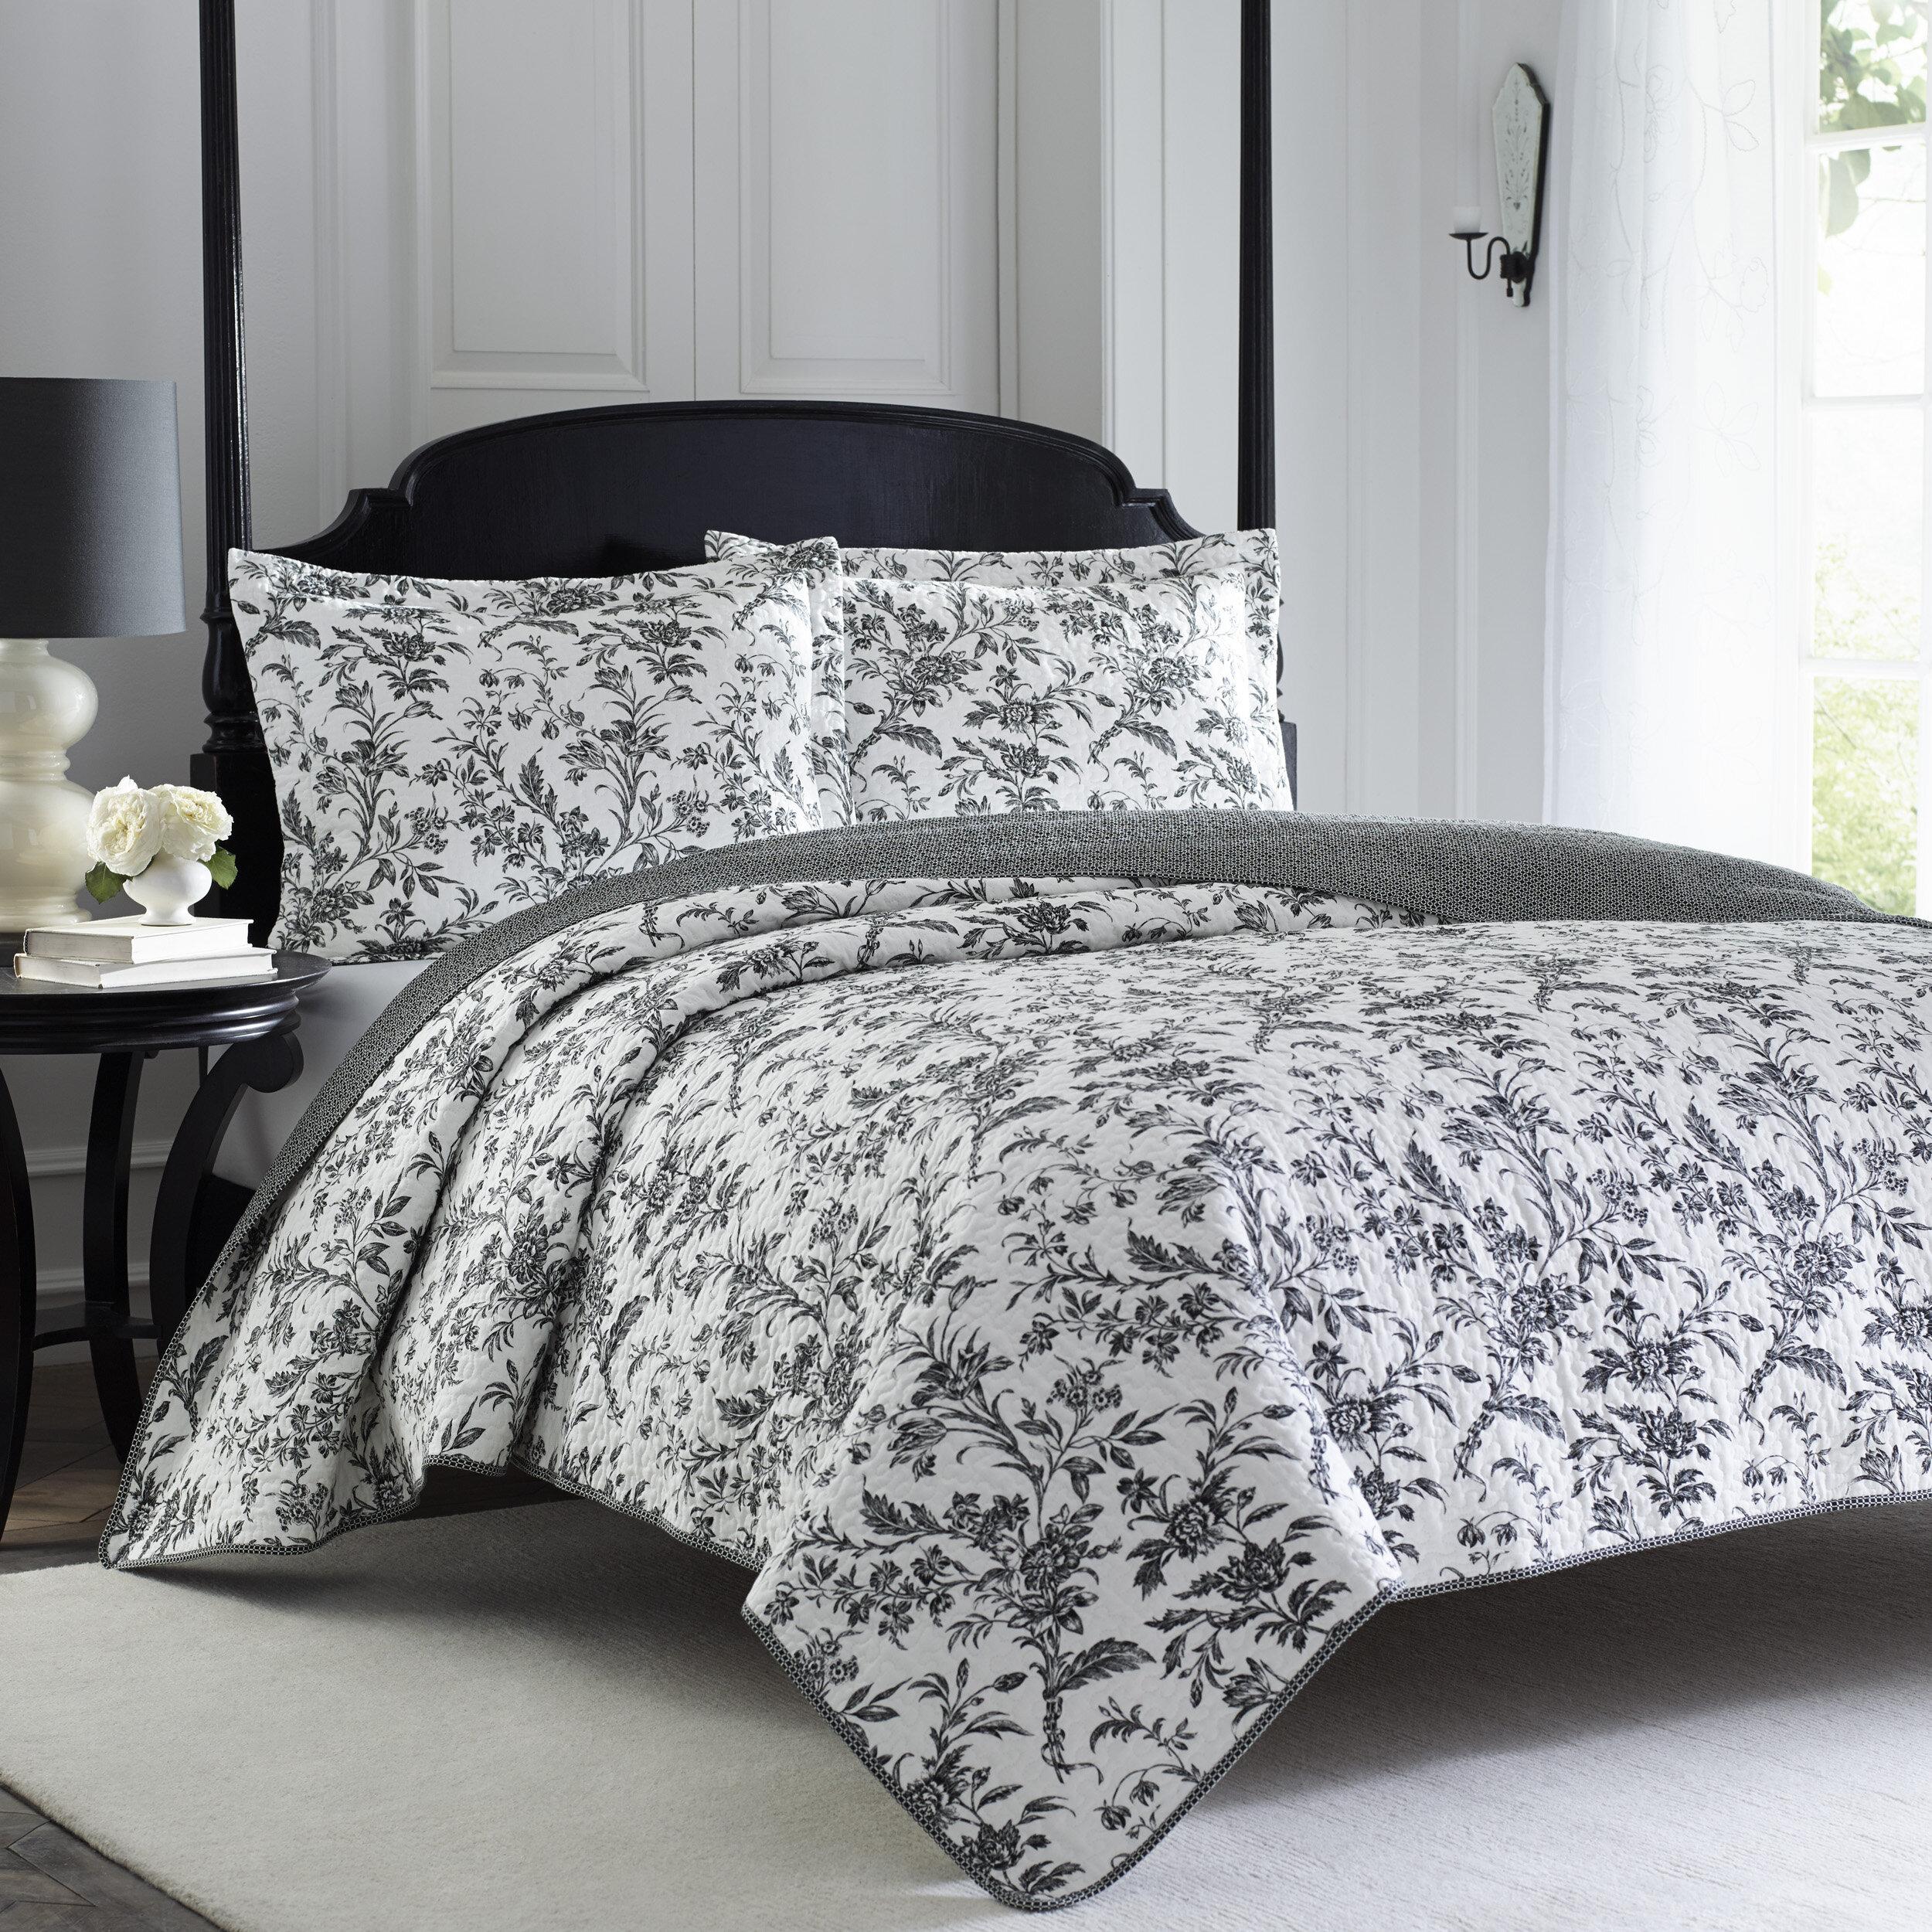 Mink Brown Soft Double Bed Duvet Cover Set Satin Stripe Button Up Closure Uk